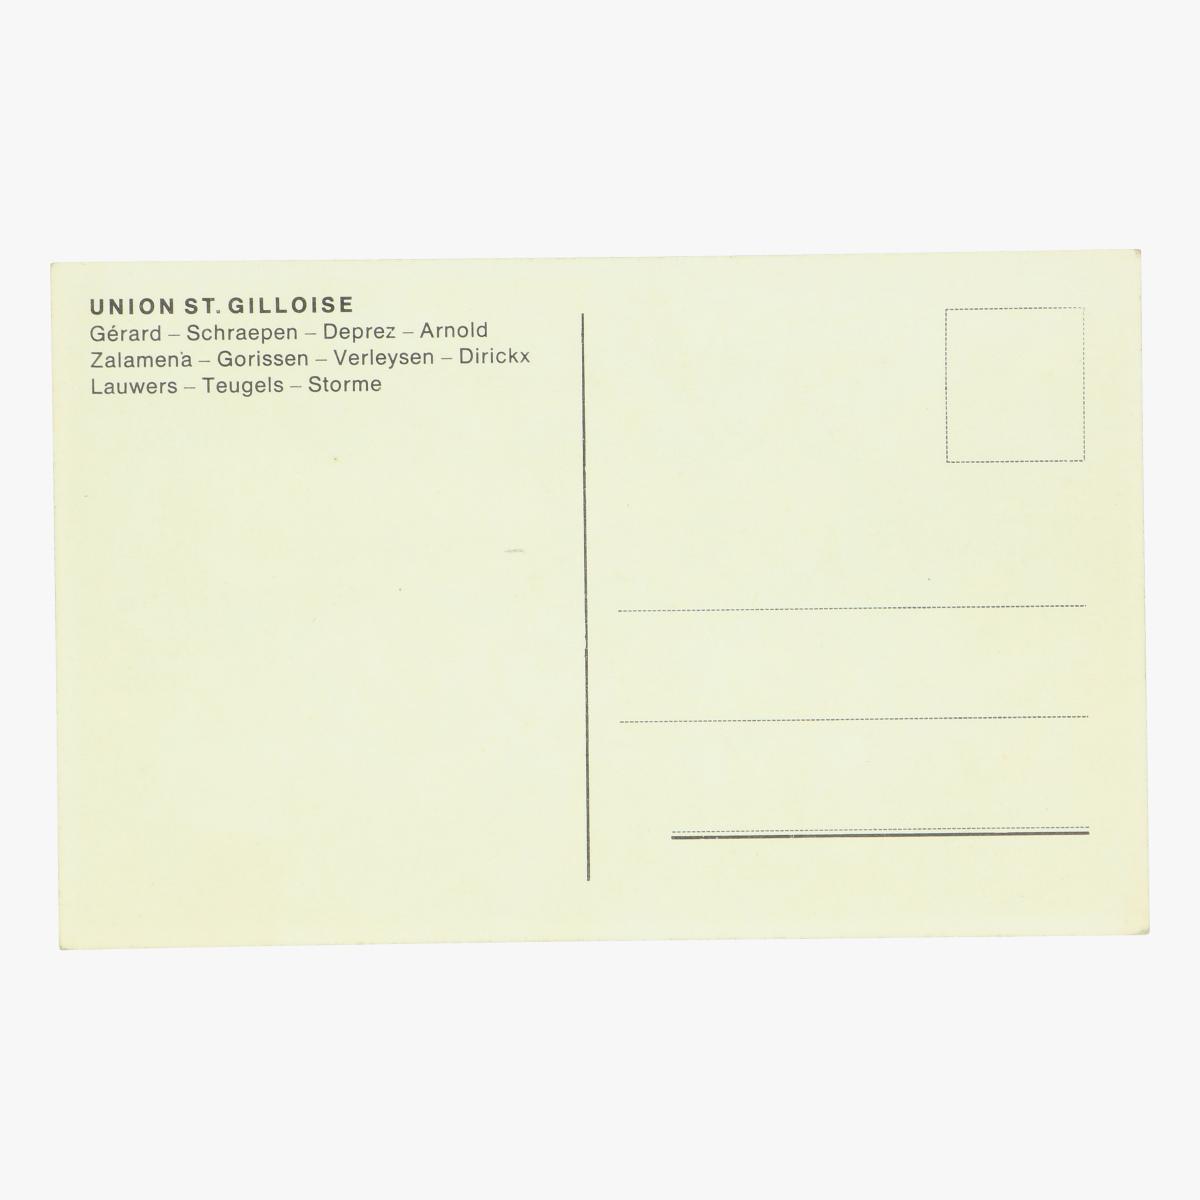 Afbeeldingen van oude postkaart voetbal union st.gilloise